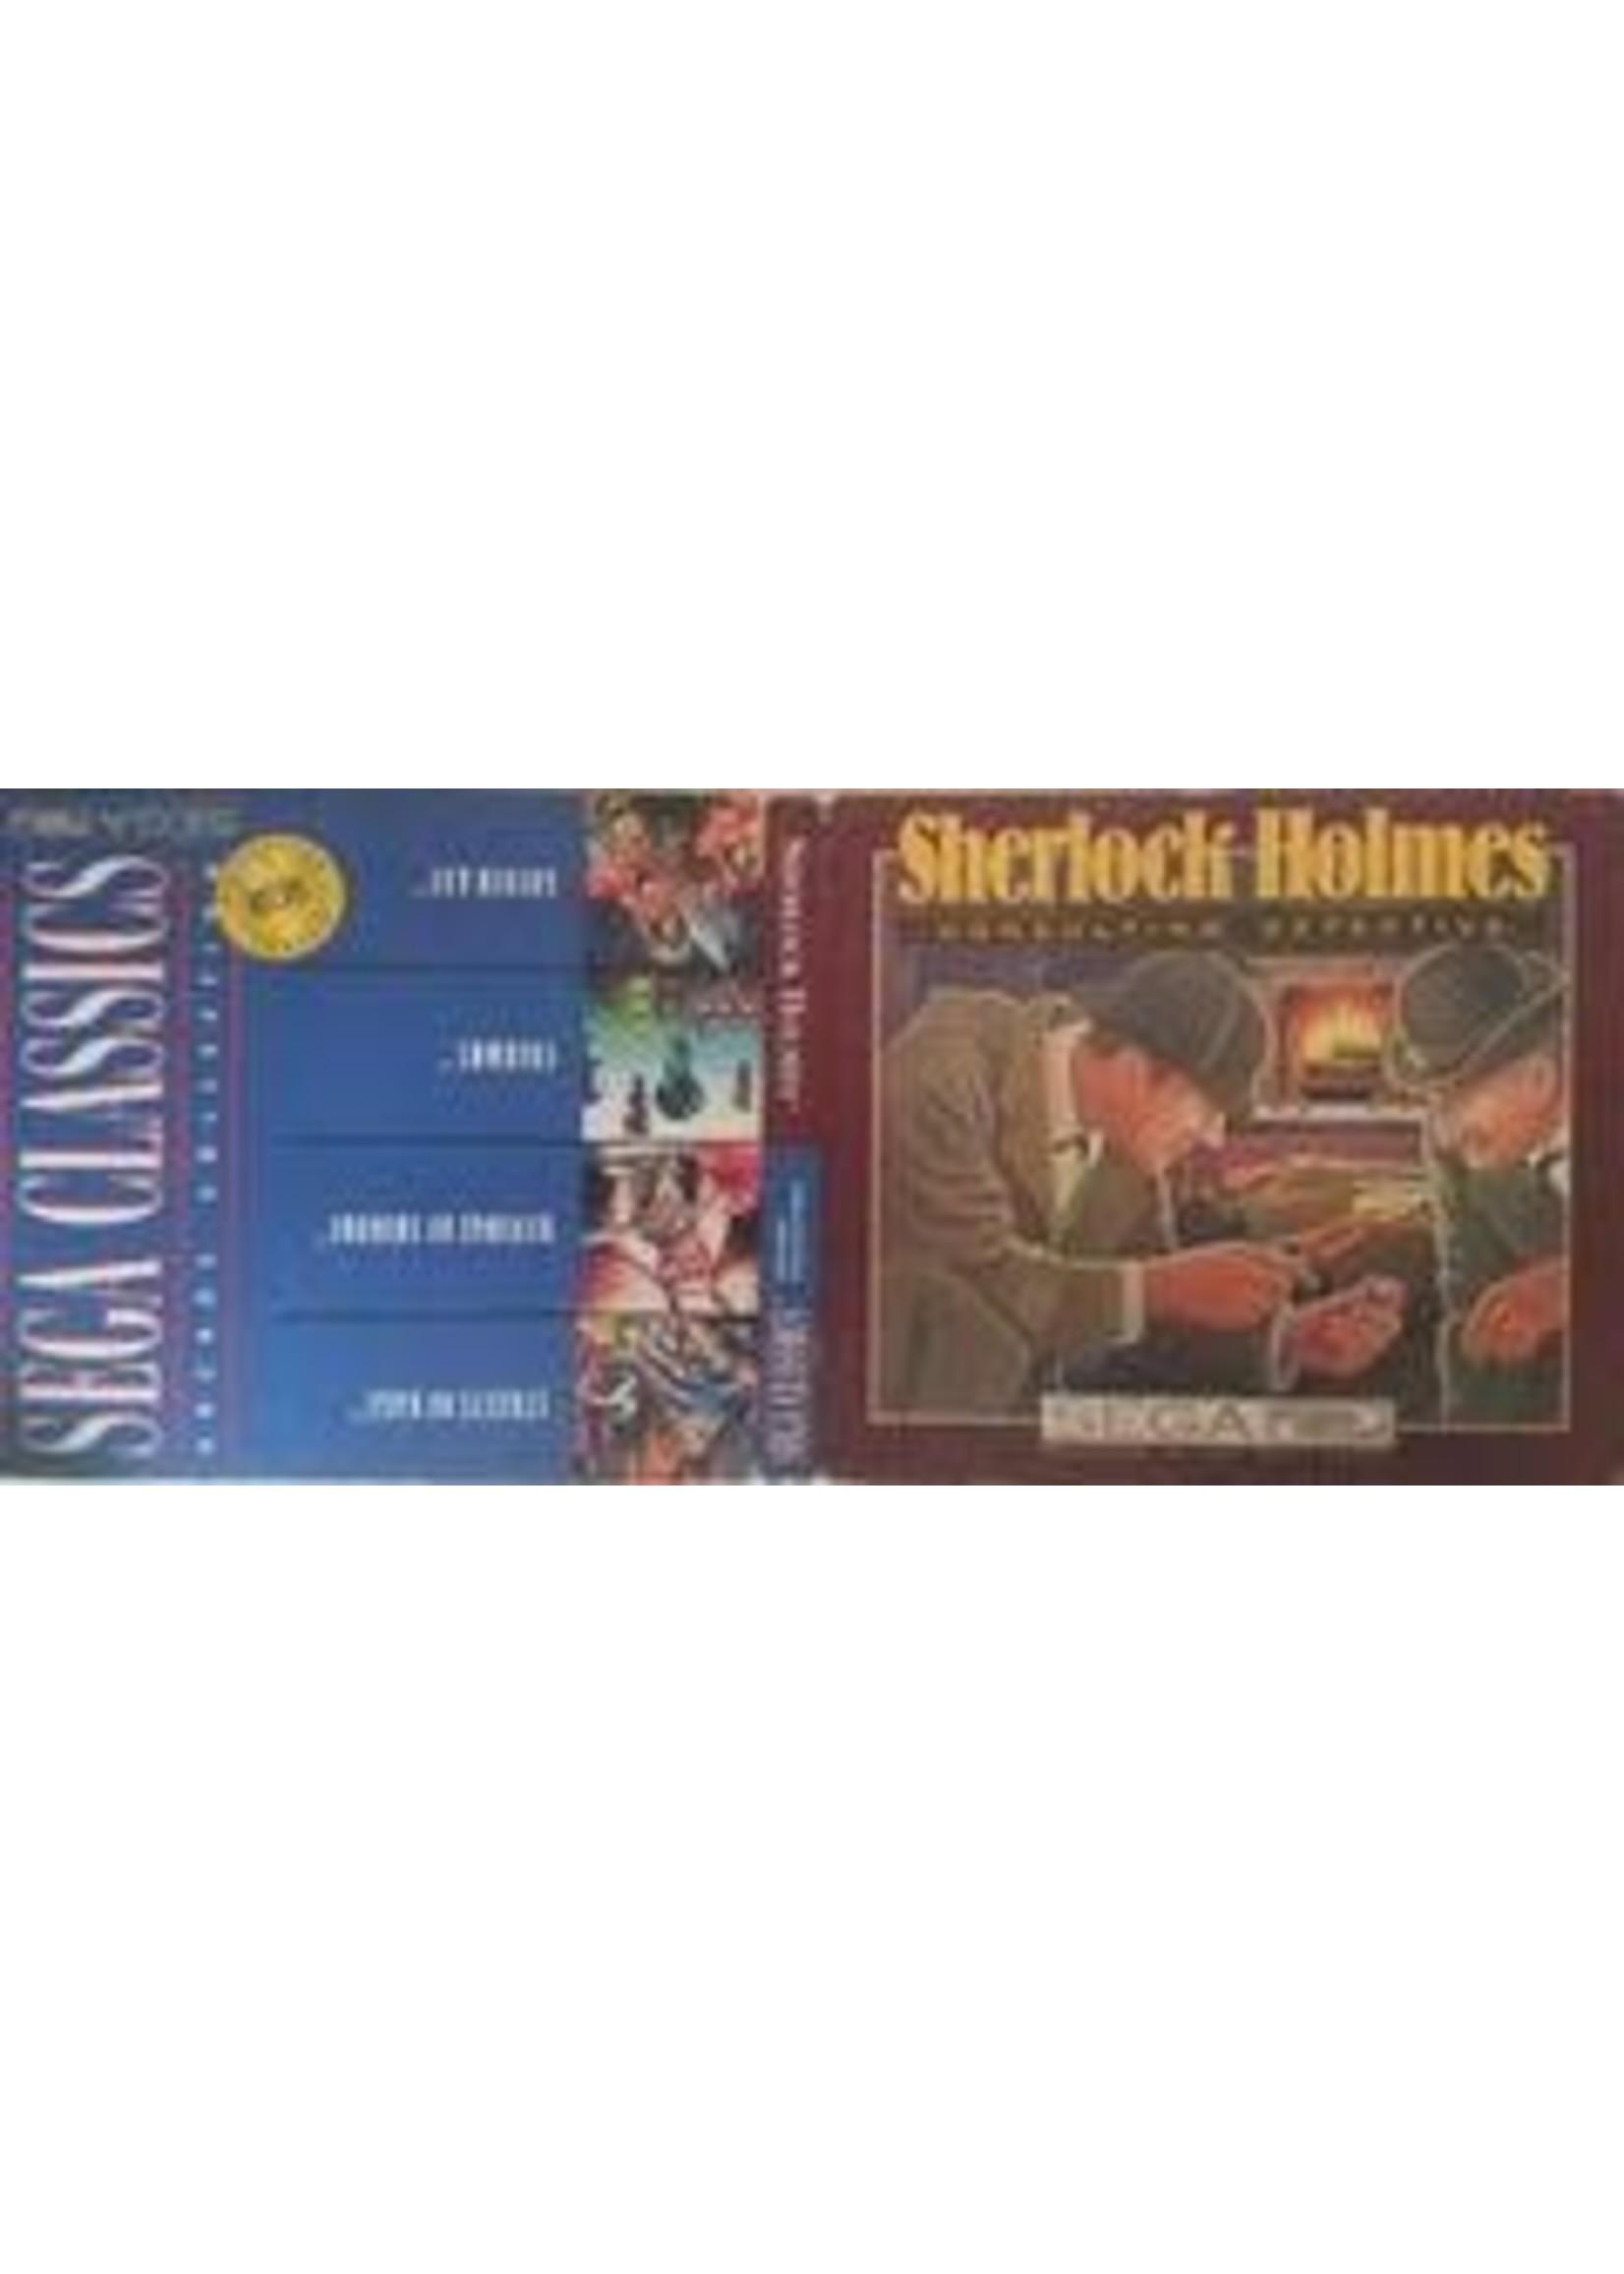 Sherlock Holmes & Sega Classics Sega CD